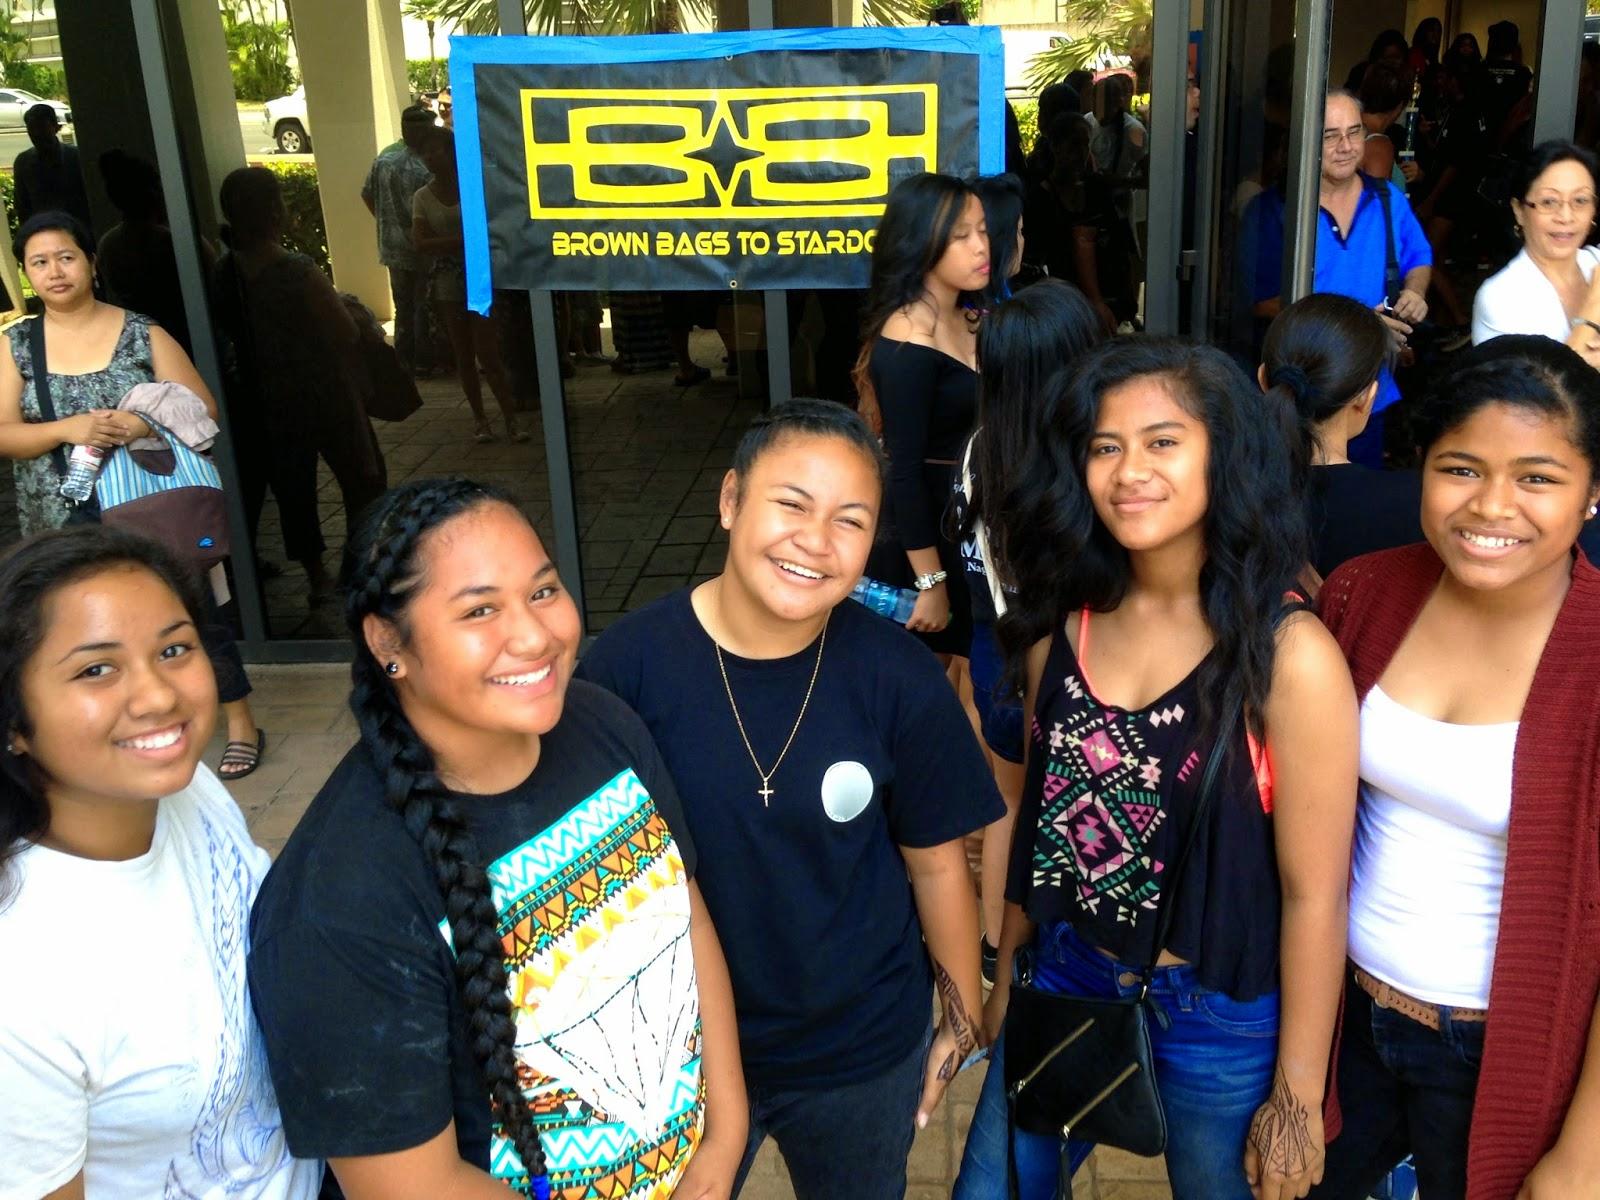 Highlands Intermediate Student Activities: Brown Bags to ...